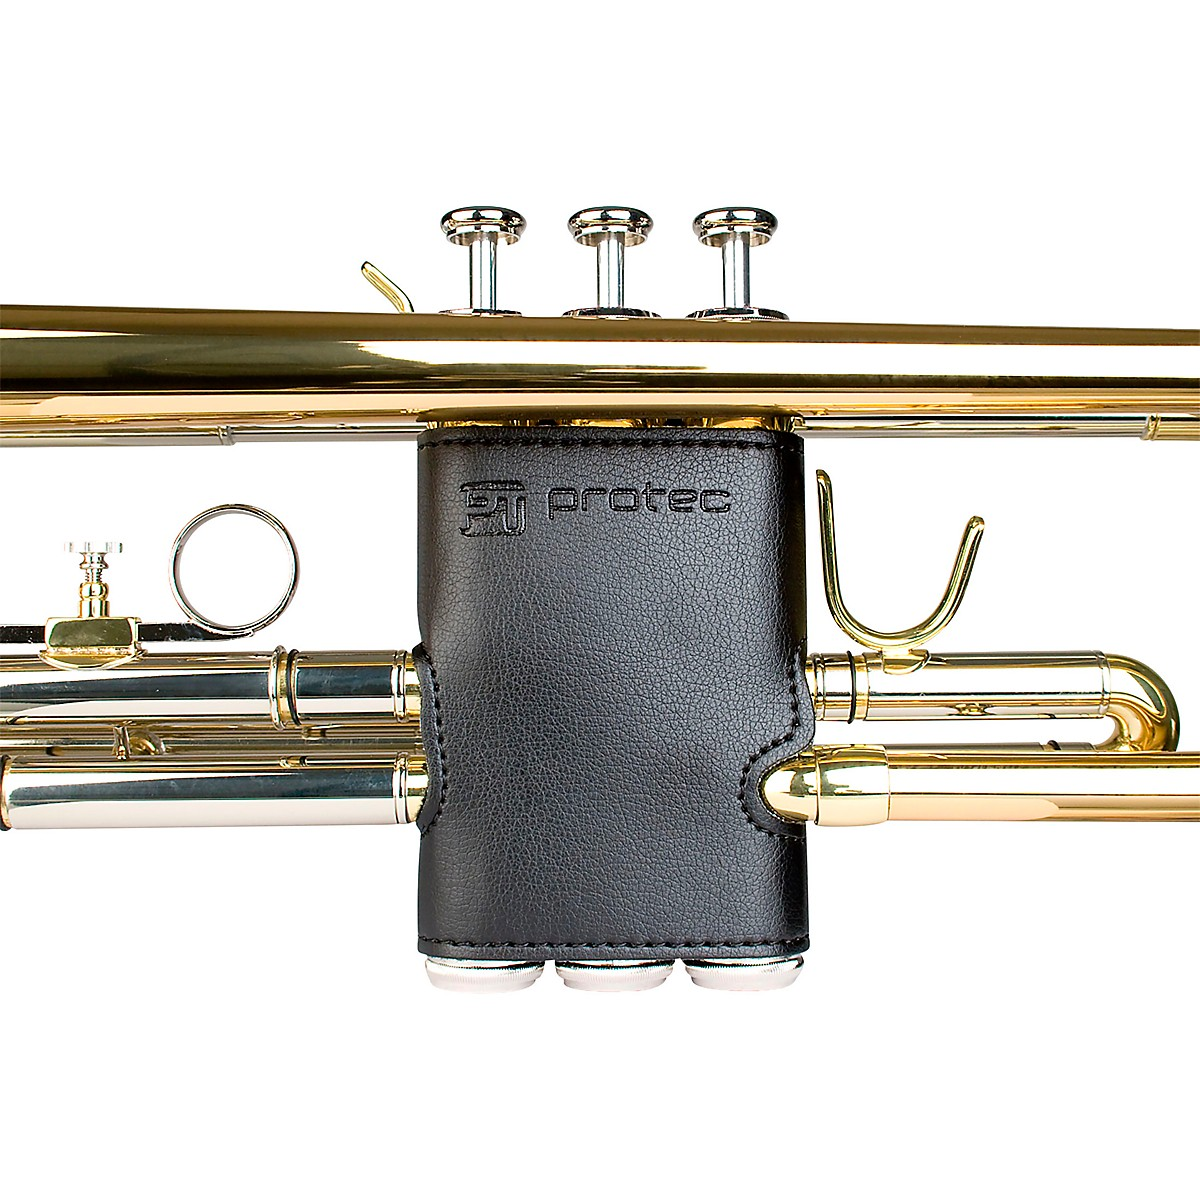 Protec Trumpet Leather Valve Guard